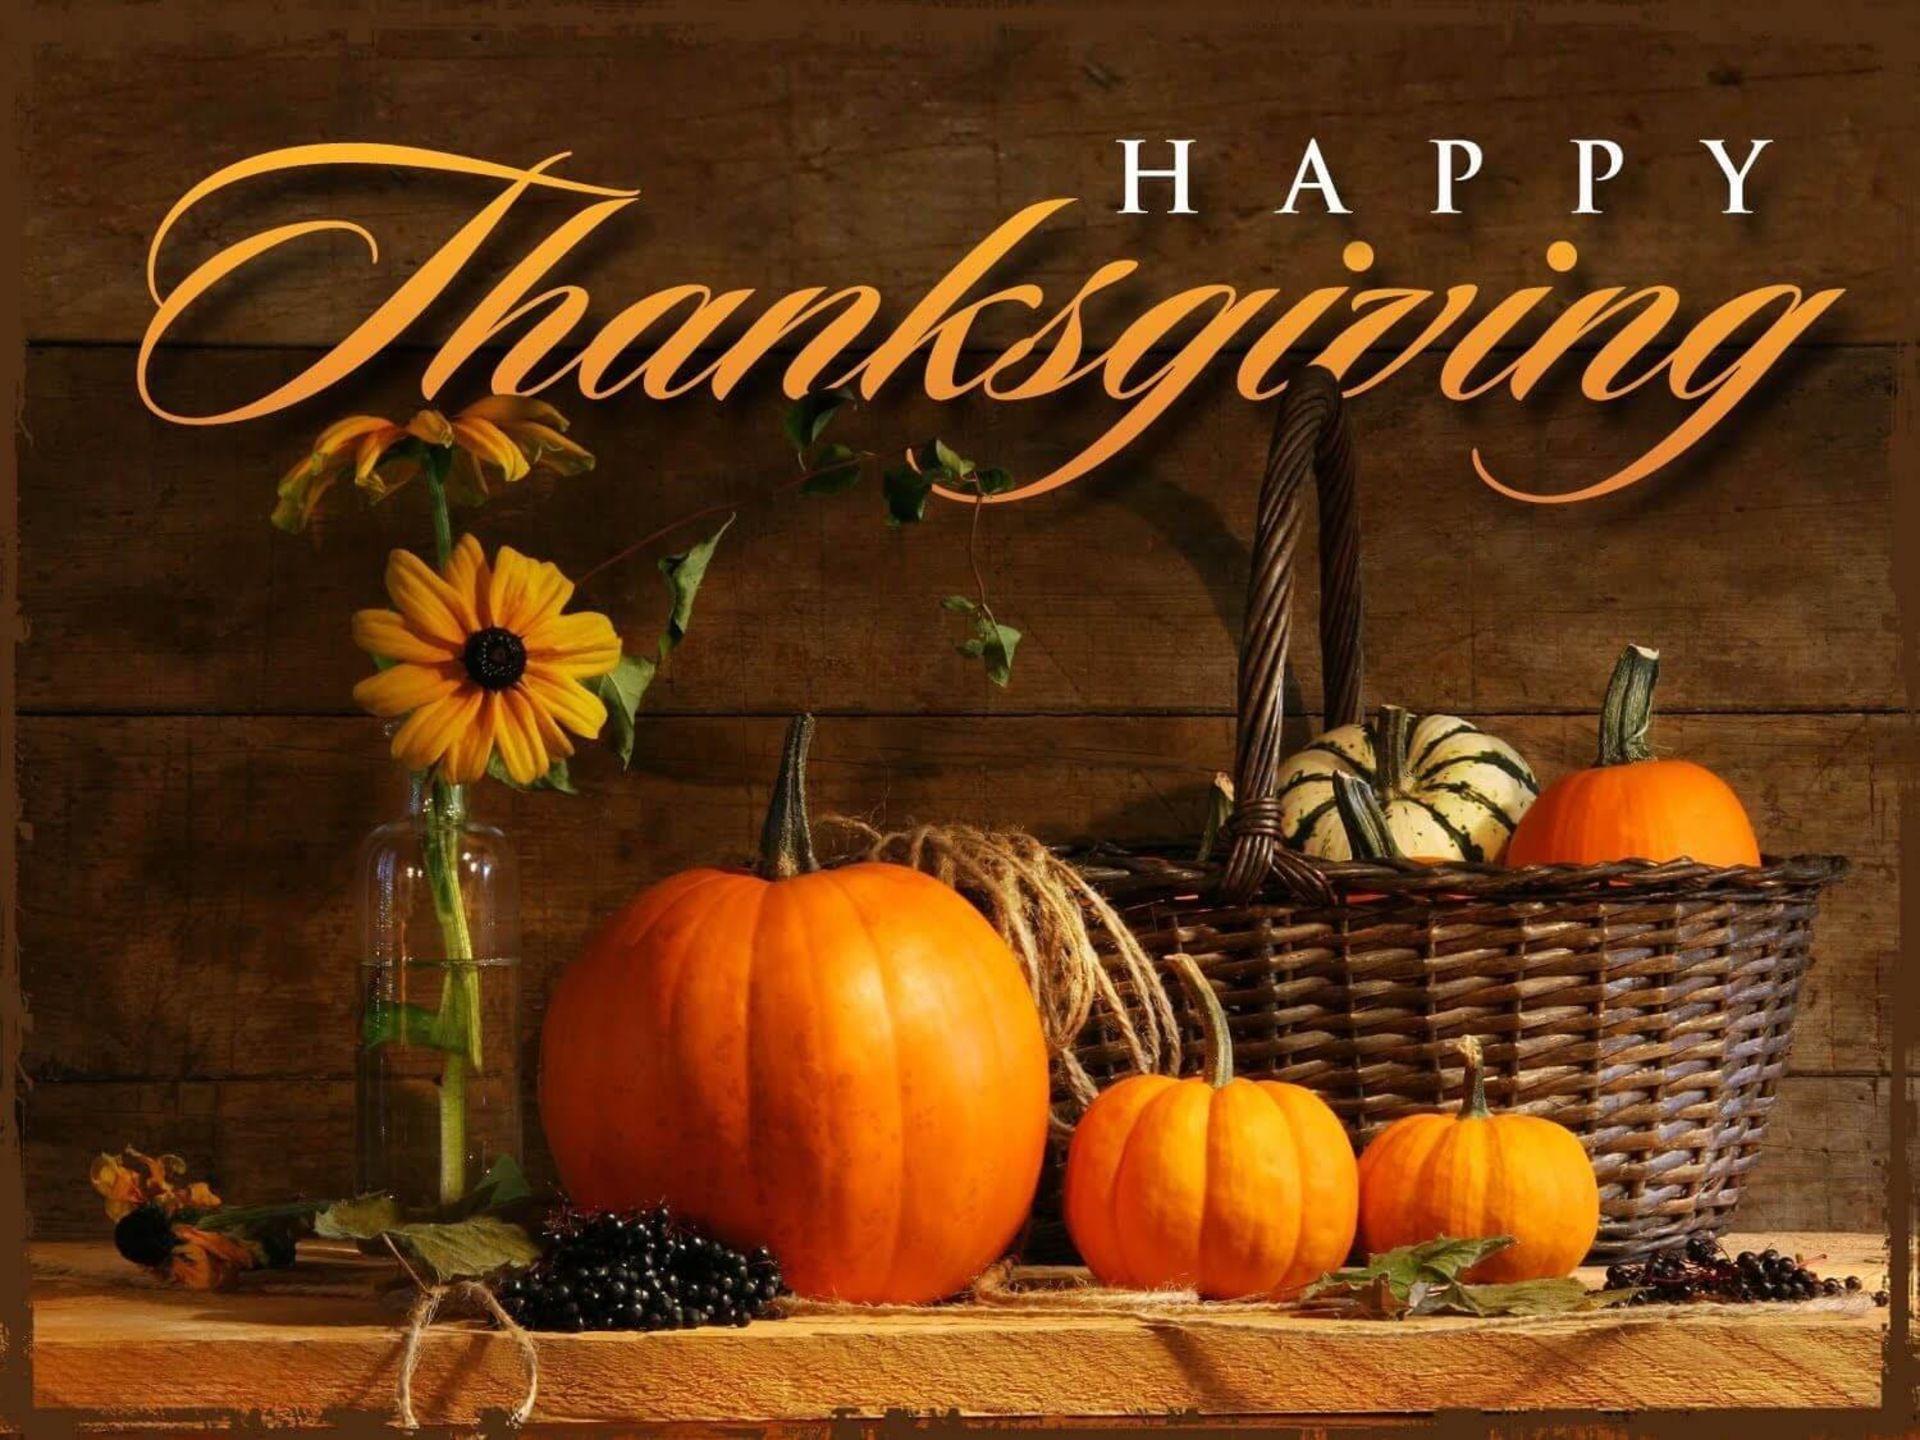 TSG Thanksgiving Giveaway!